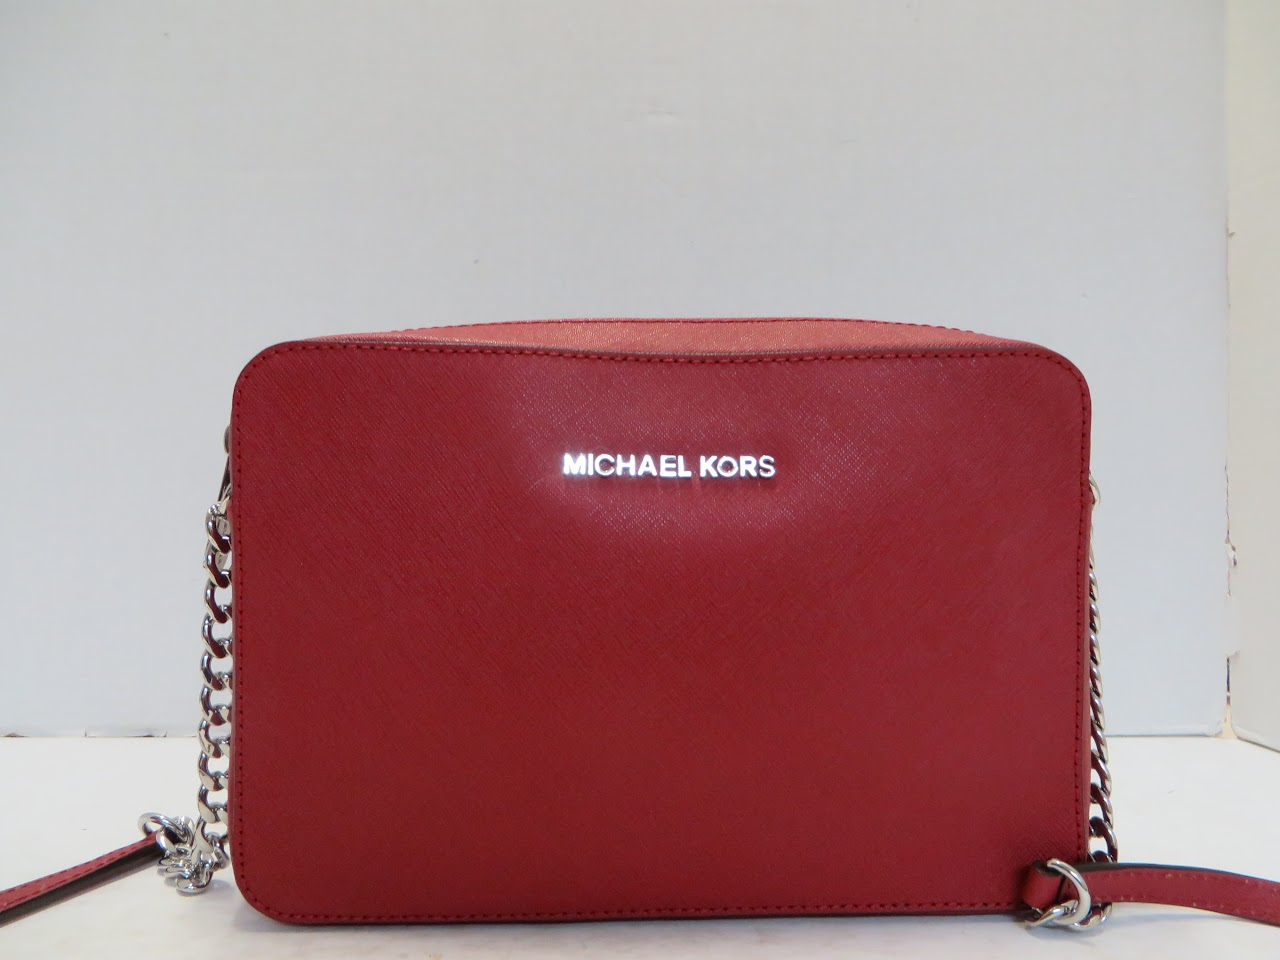 Michael Kors Structured Bag